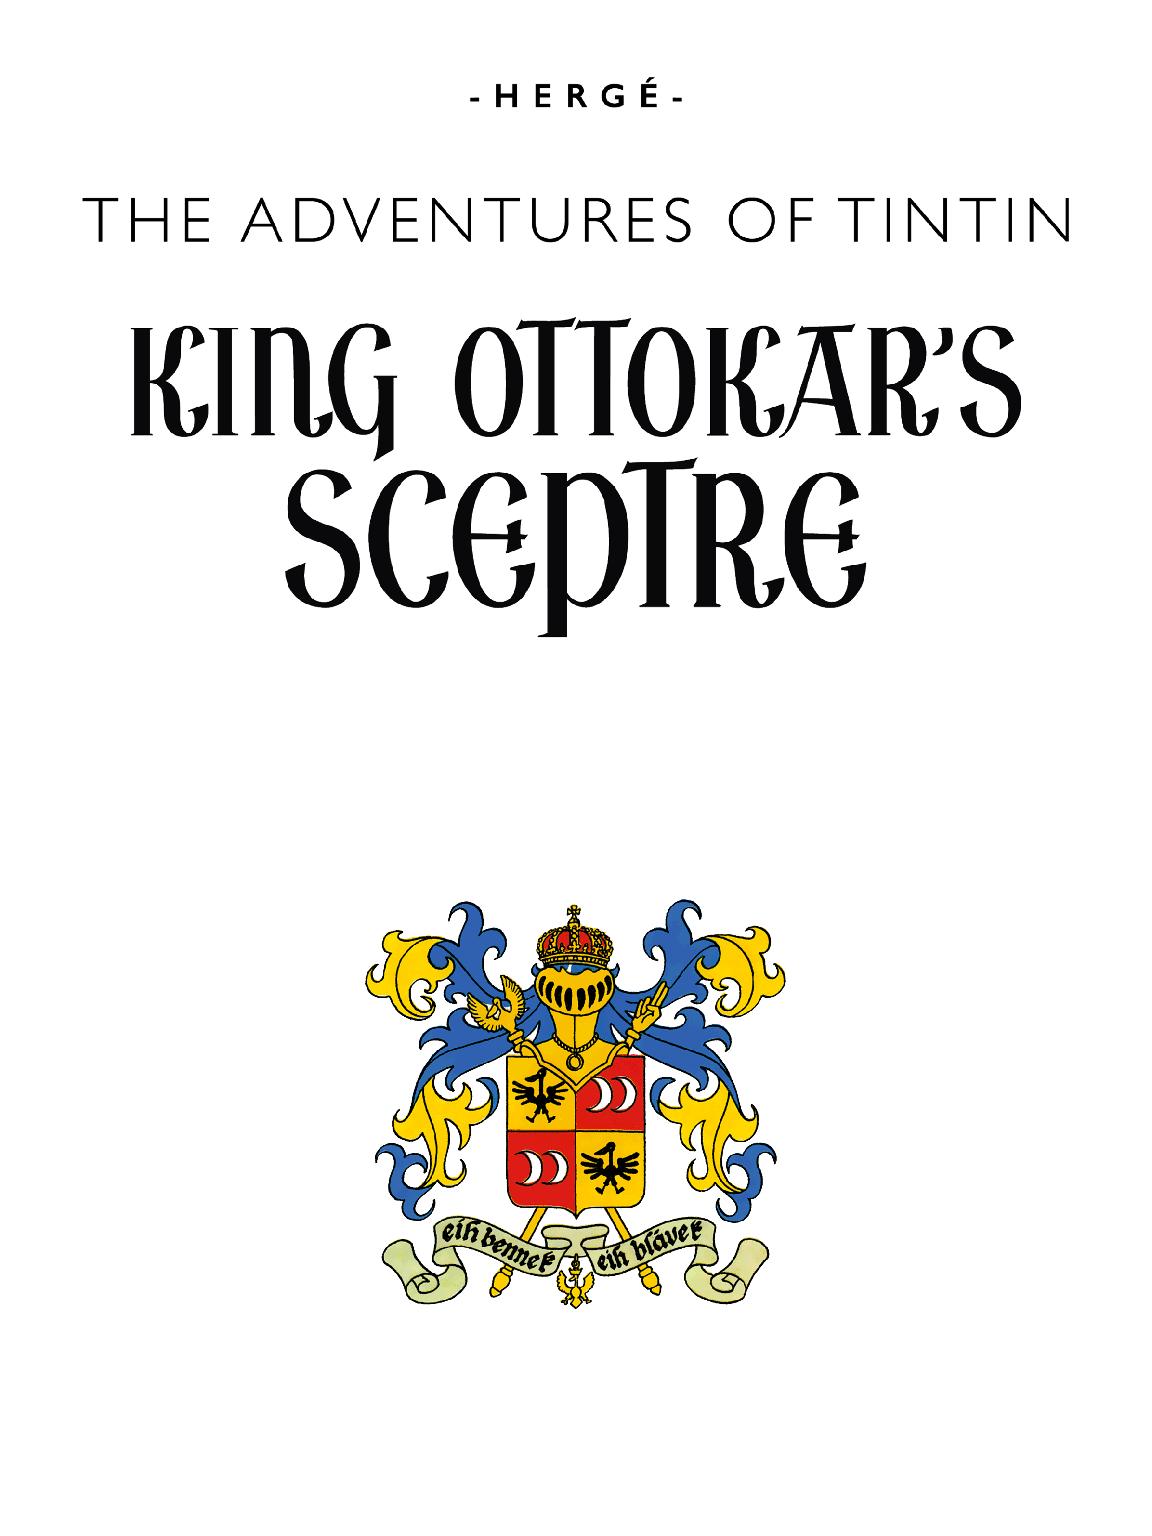 King Ottokar's Sceptre - Title page